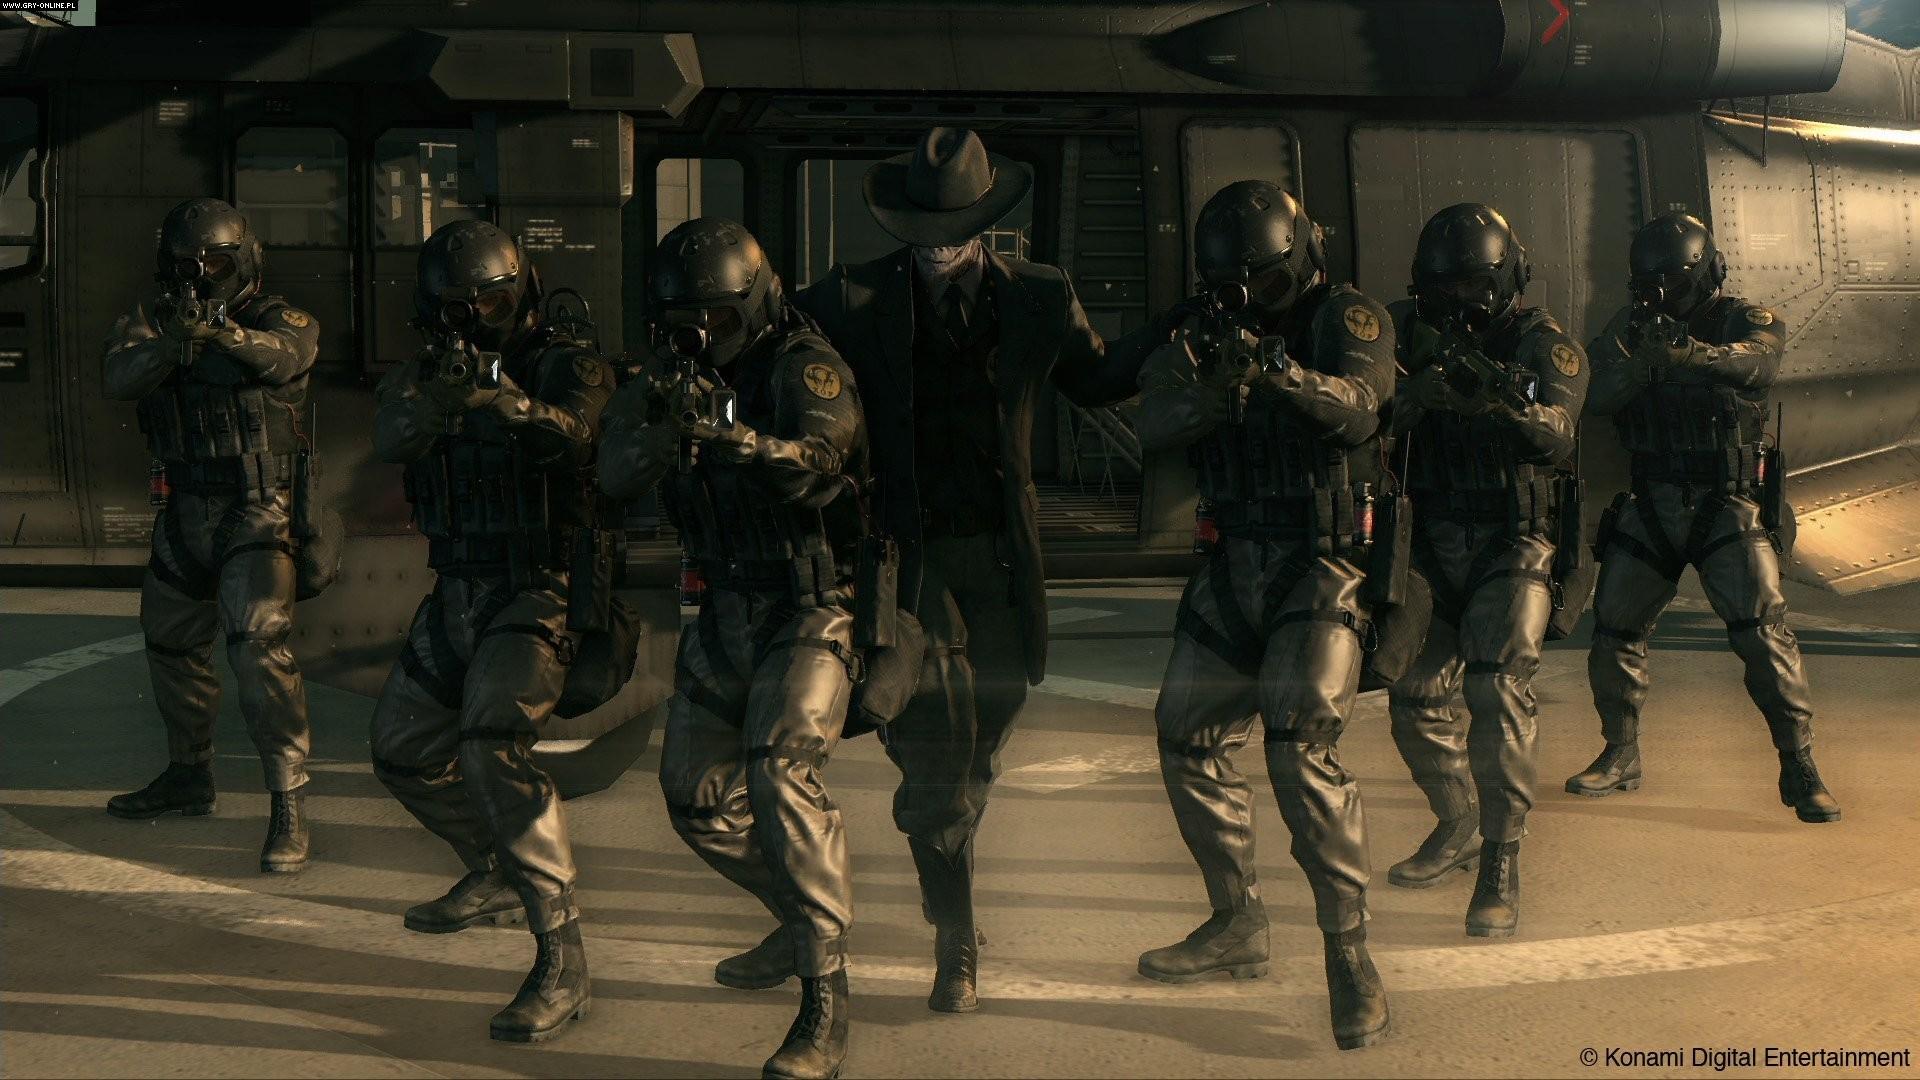 12 HD Metal Gear Solid 5 Desktop Wallpapers For Free Download